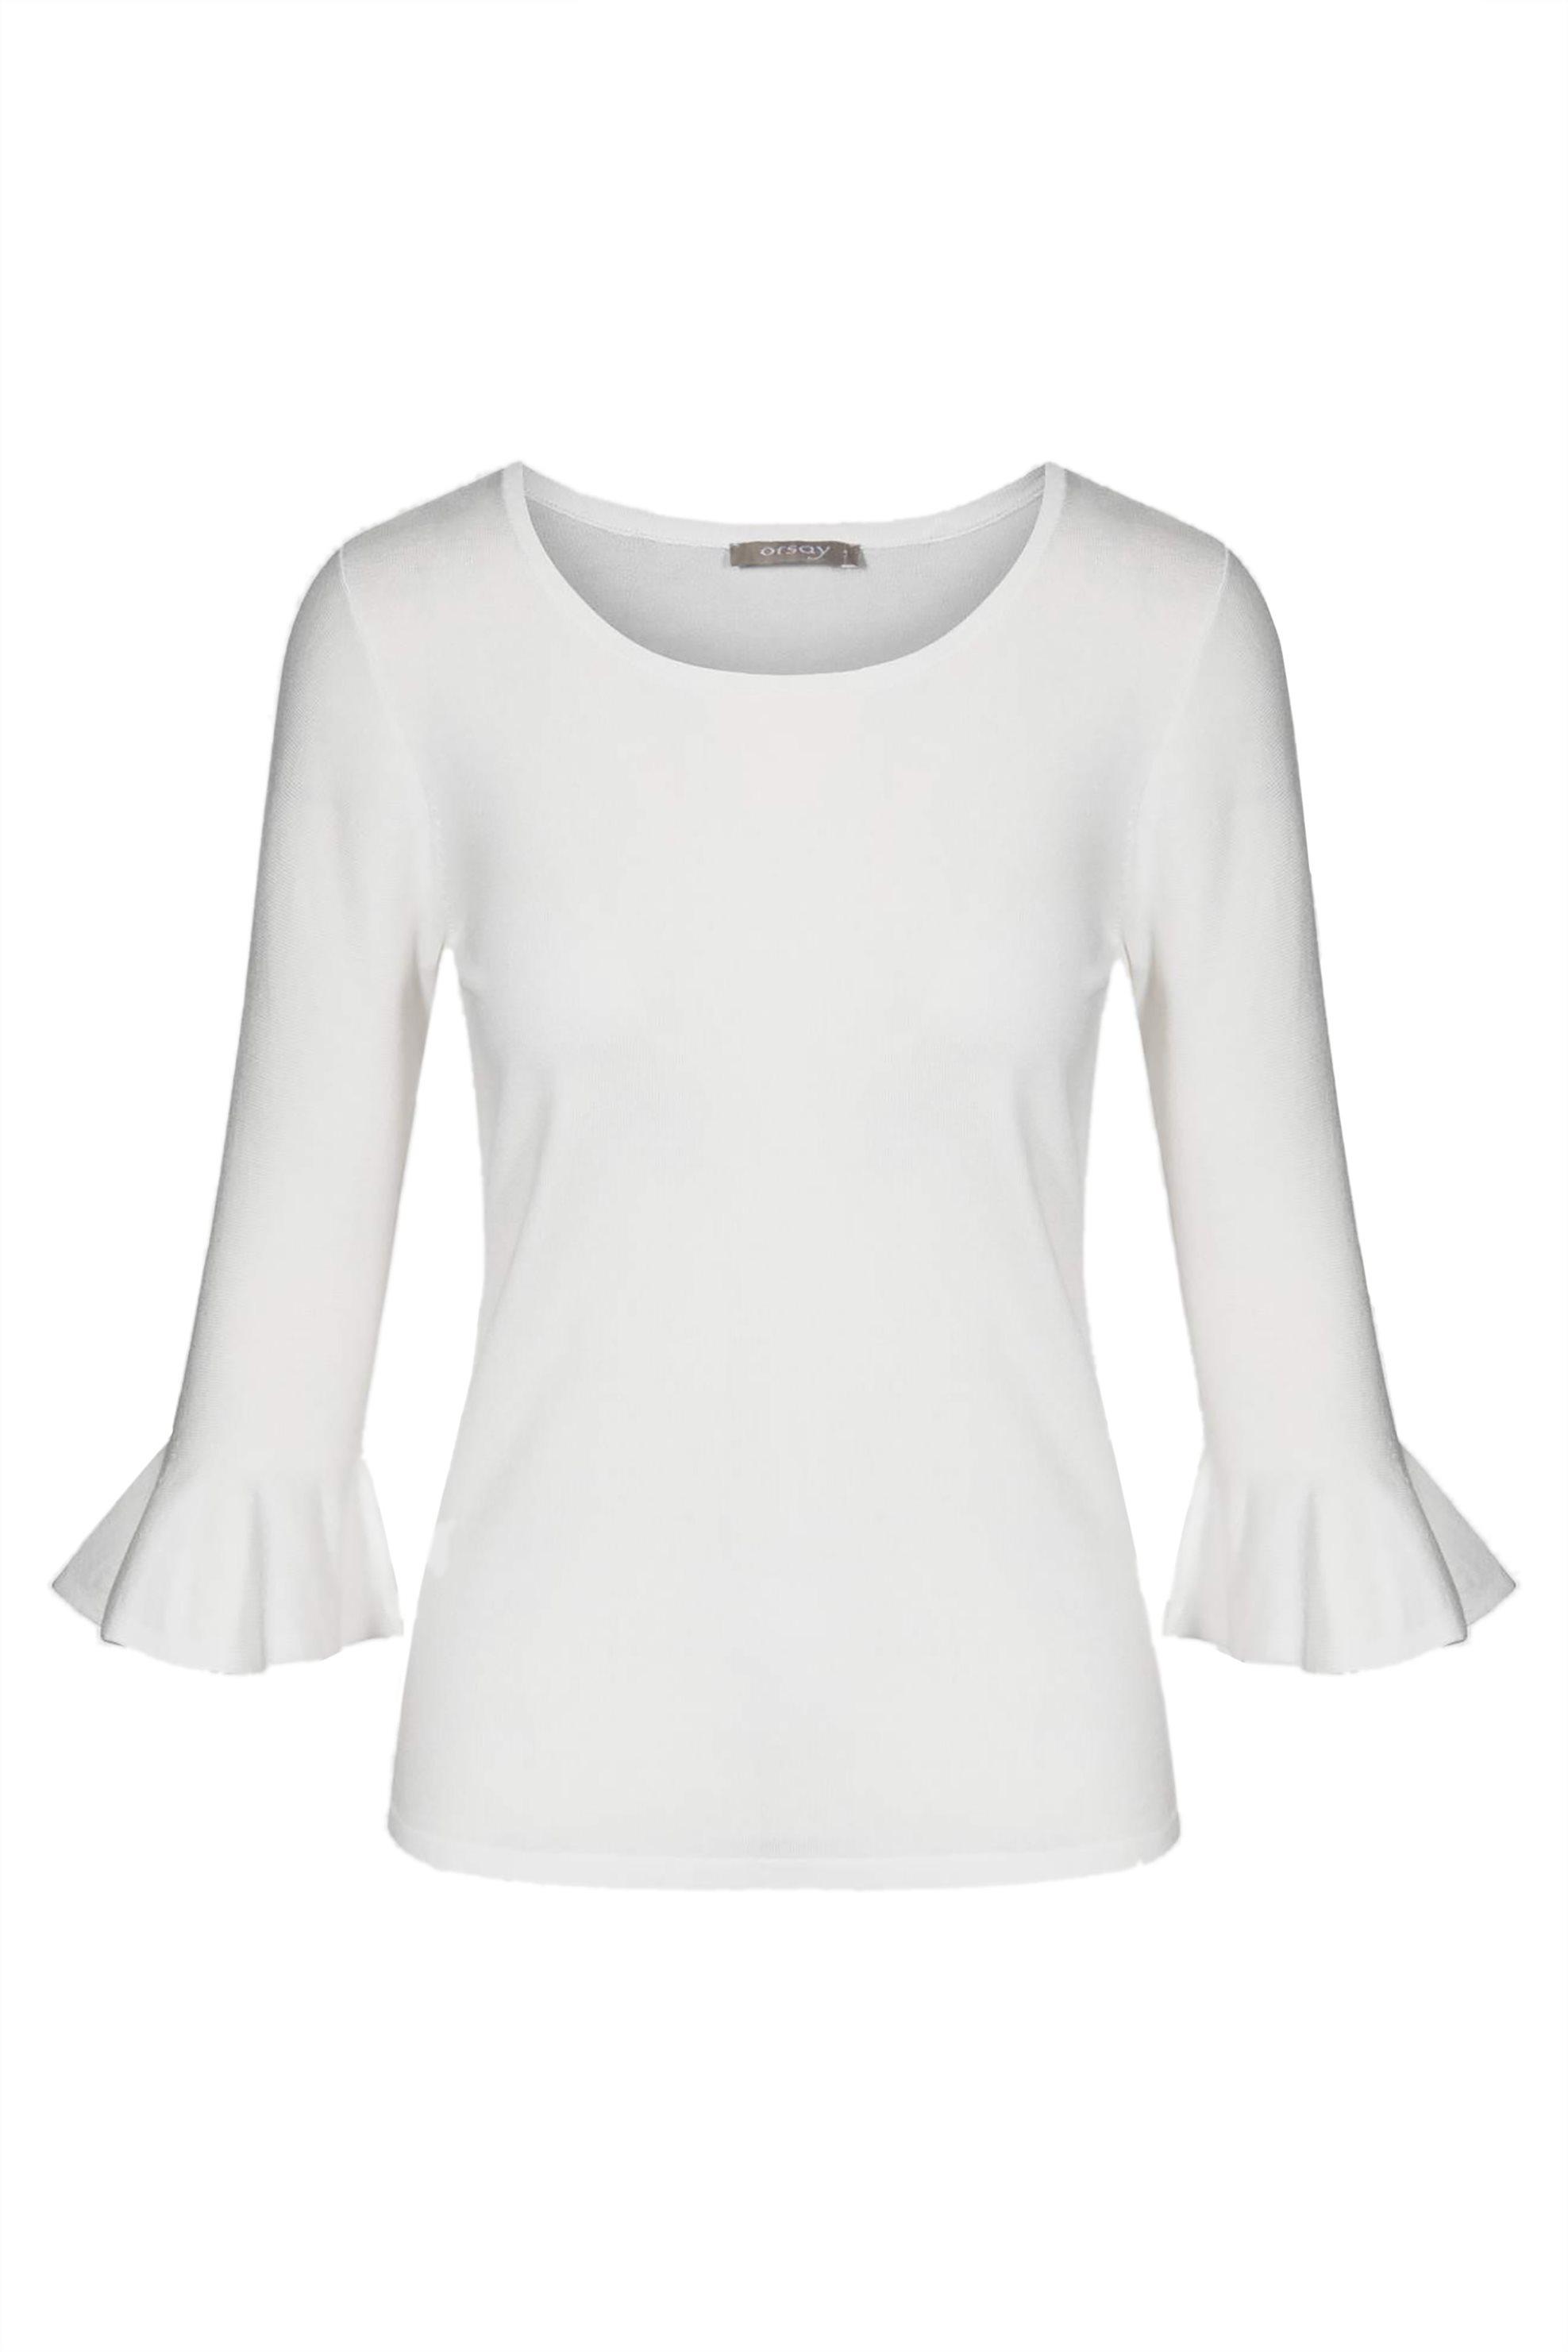 9a12078ea819 Γυναικεία   Ρούχα   Μπλούζες   All Day   TOP SECRET TOP SECRET ...